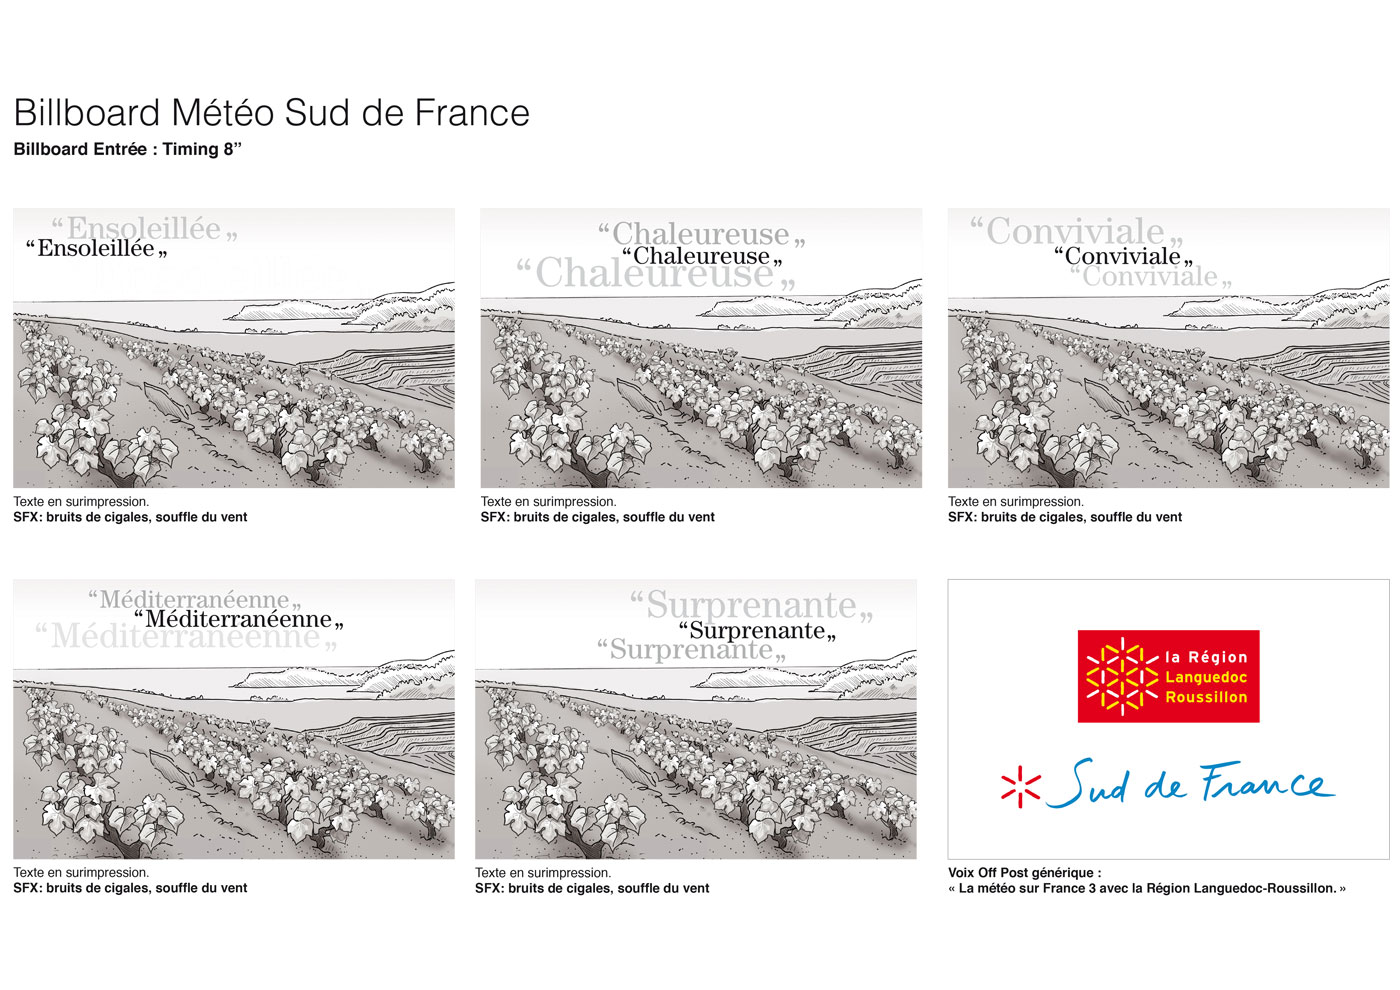 image-storyboard-billboard.jpg